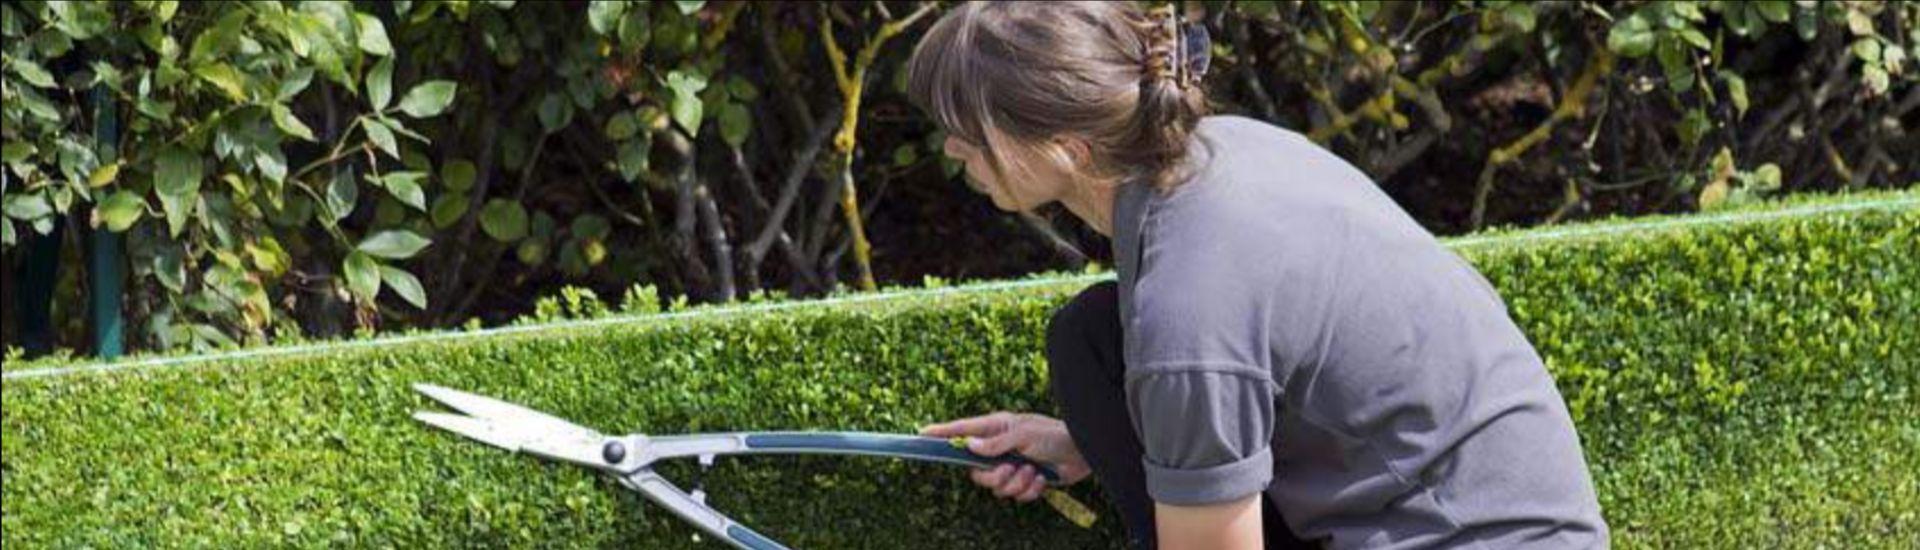 Servide de jardinage et bricolage ADMR Tarn